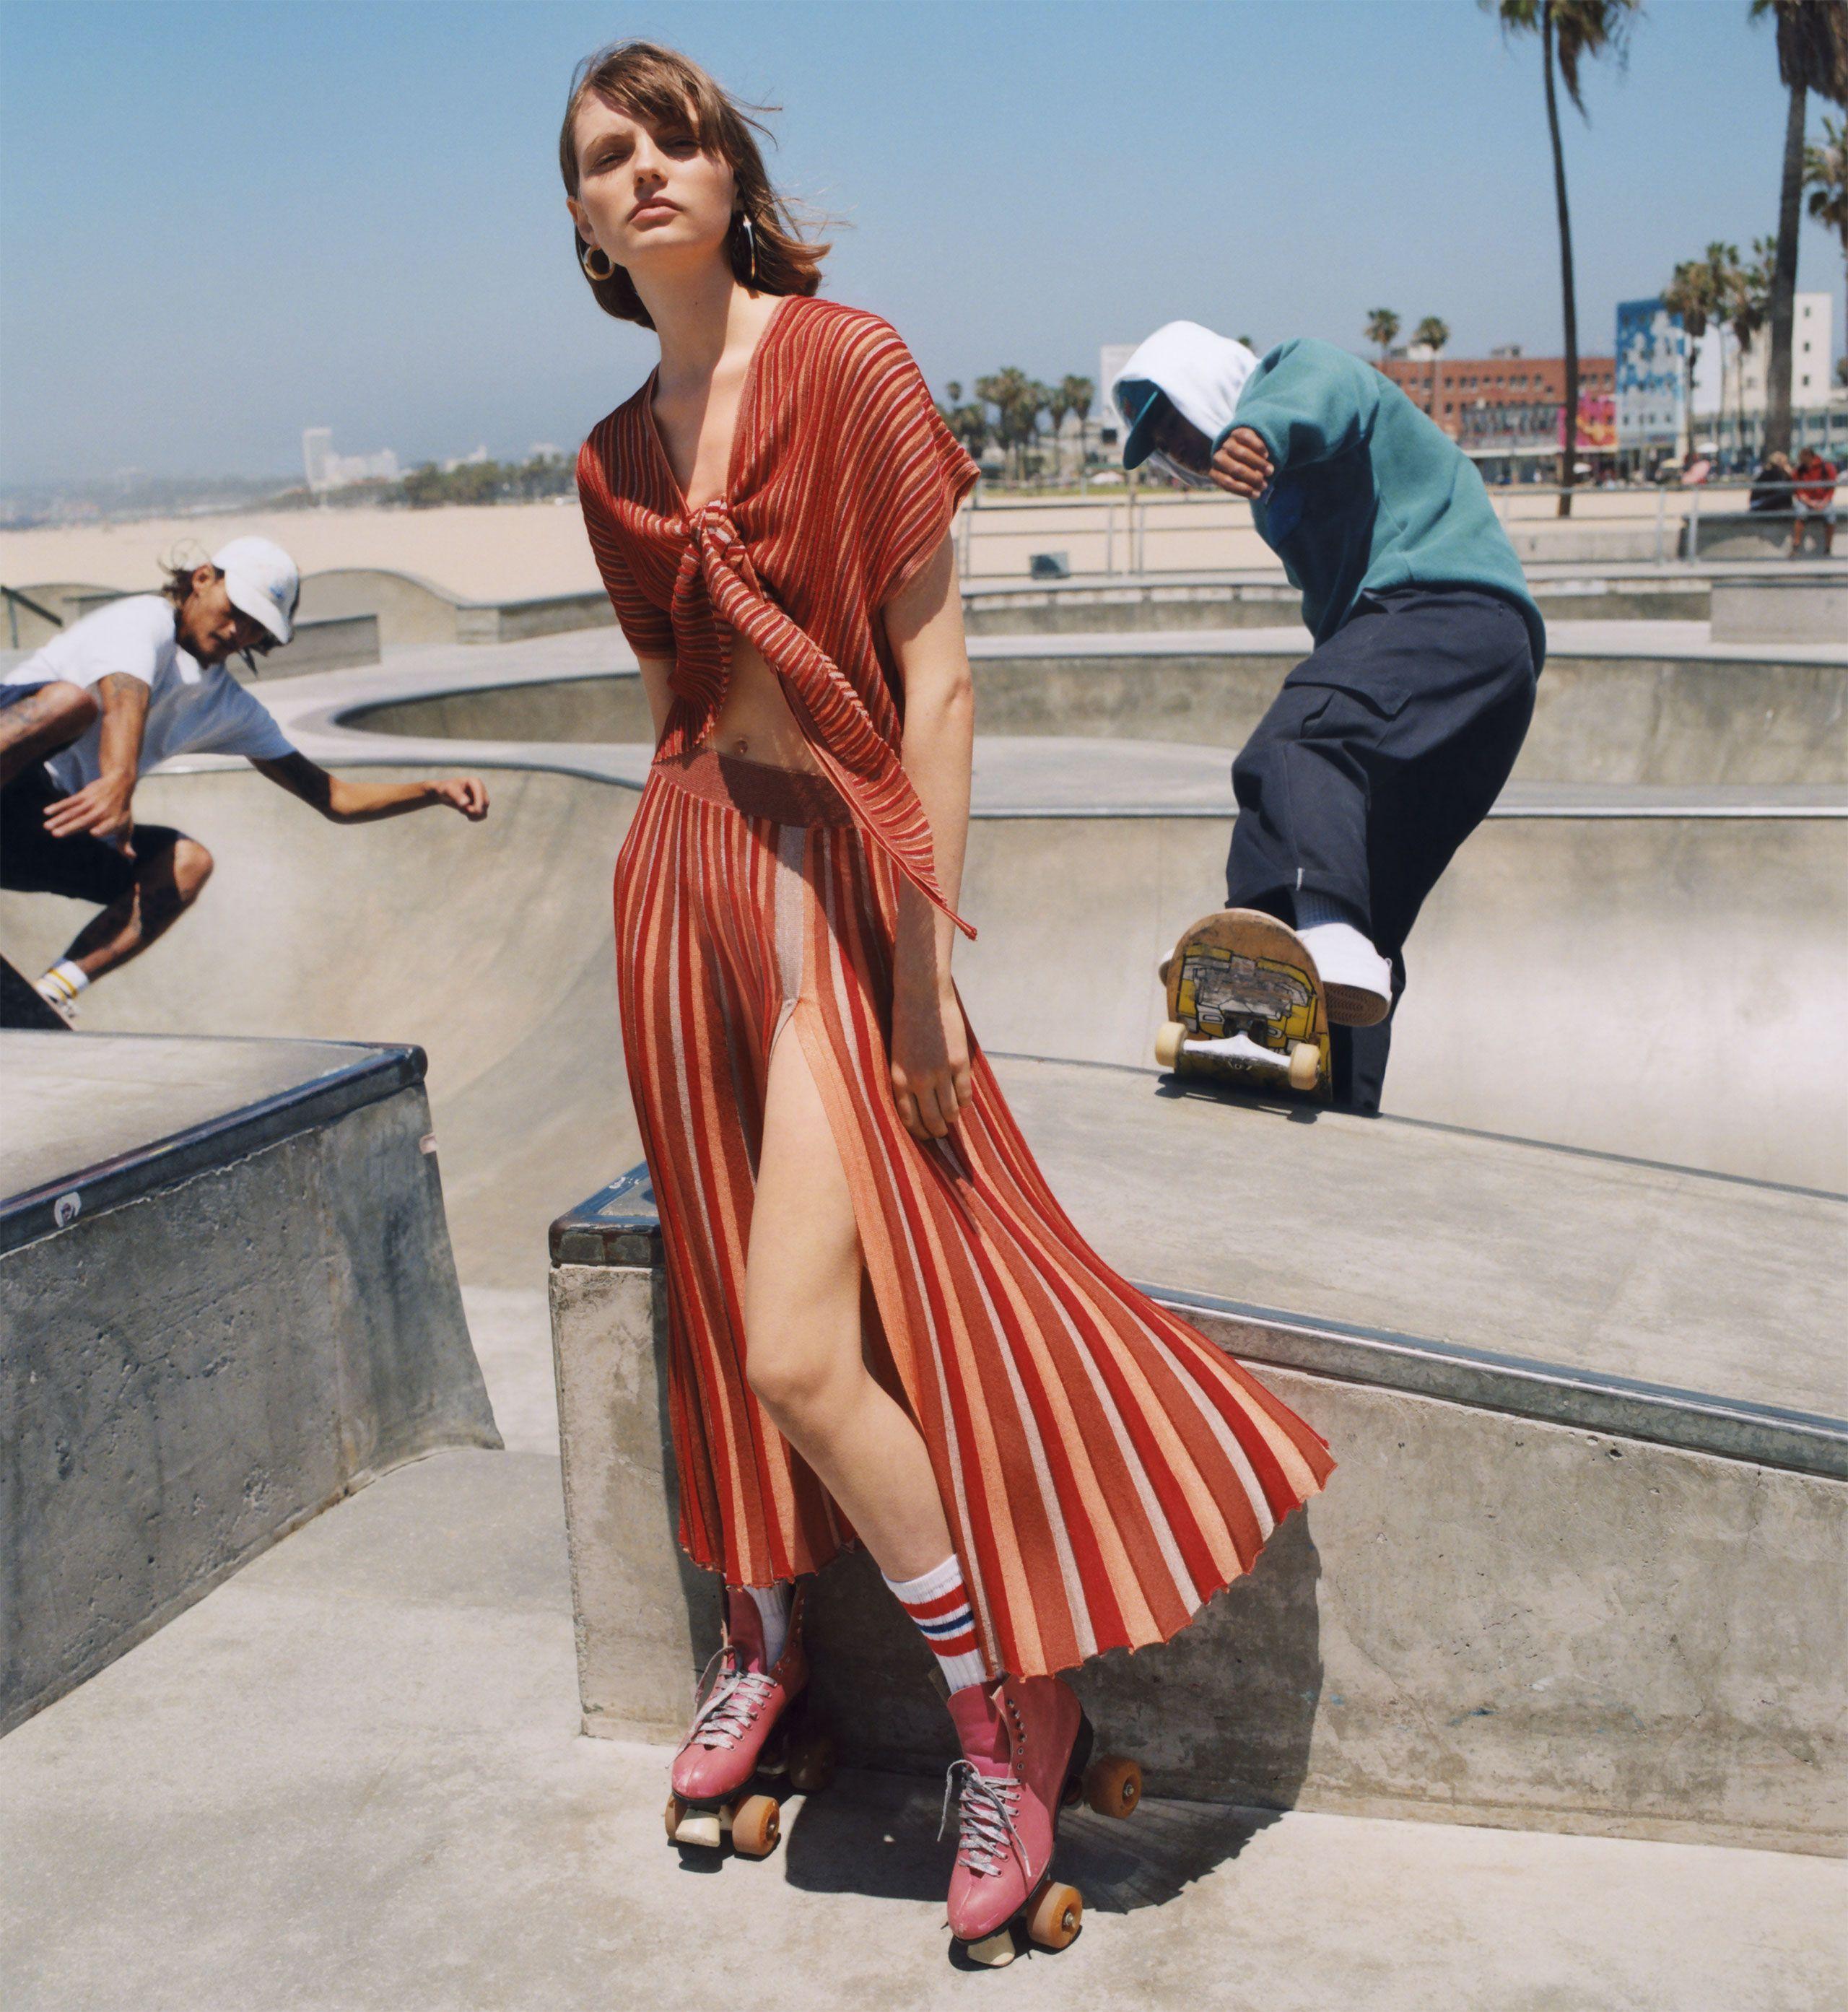 afb69578039b ZARA -  zaraeditorial - SKATE PARK - Editorial Fashion Shoot